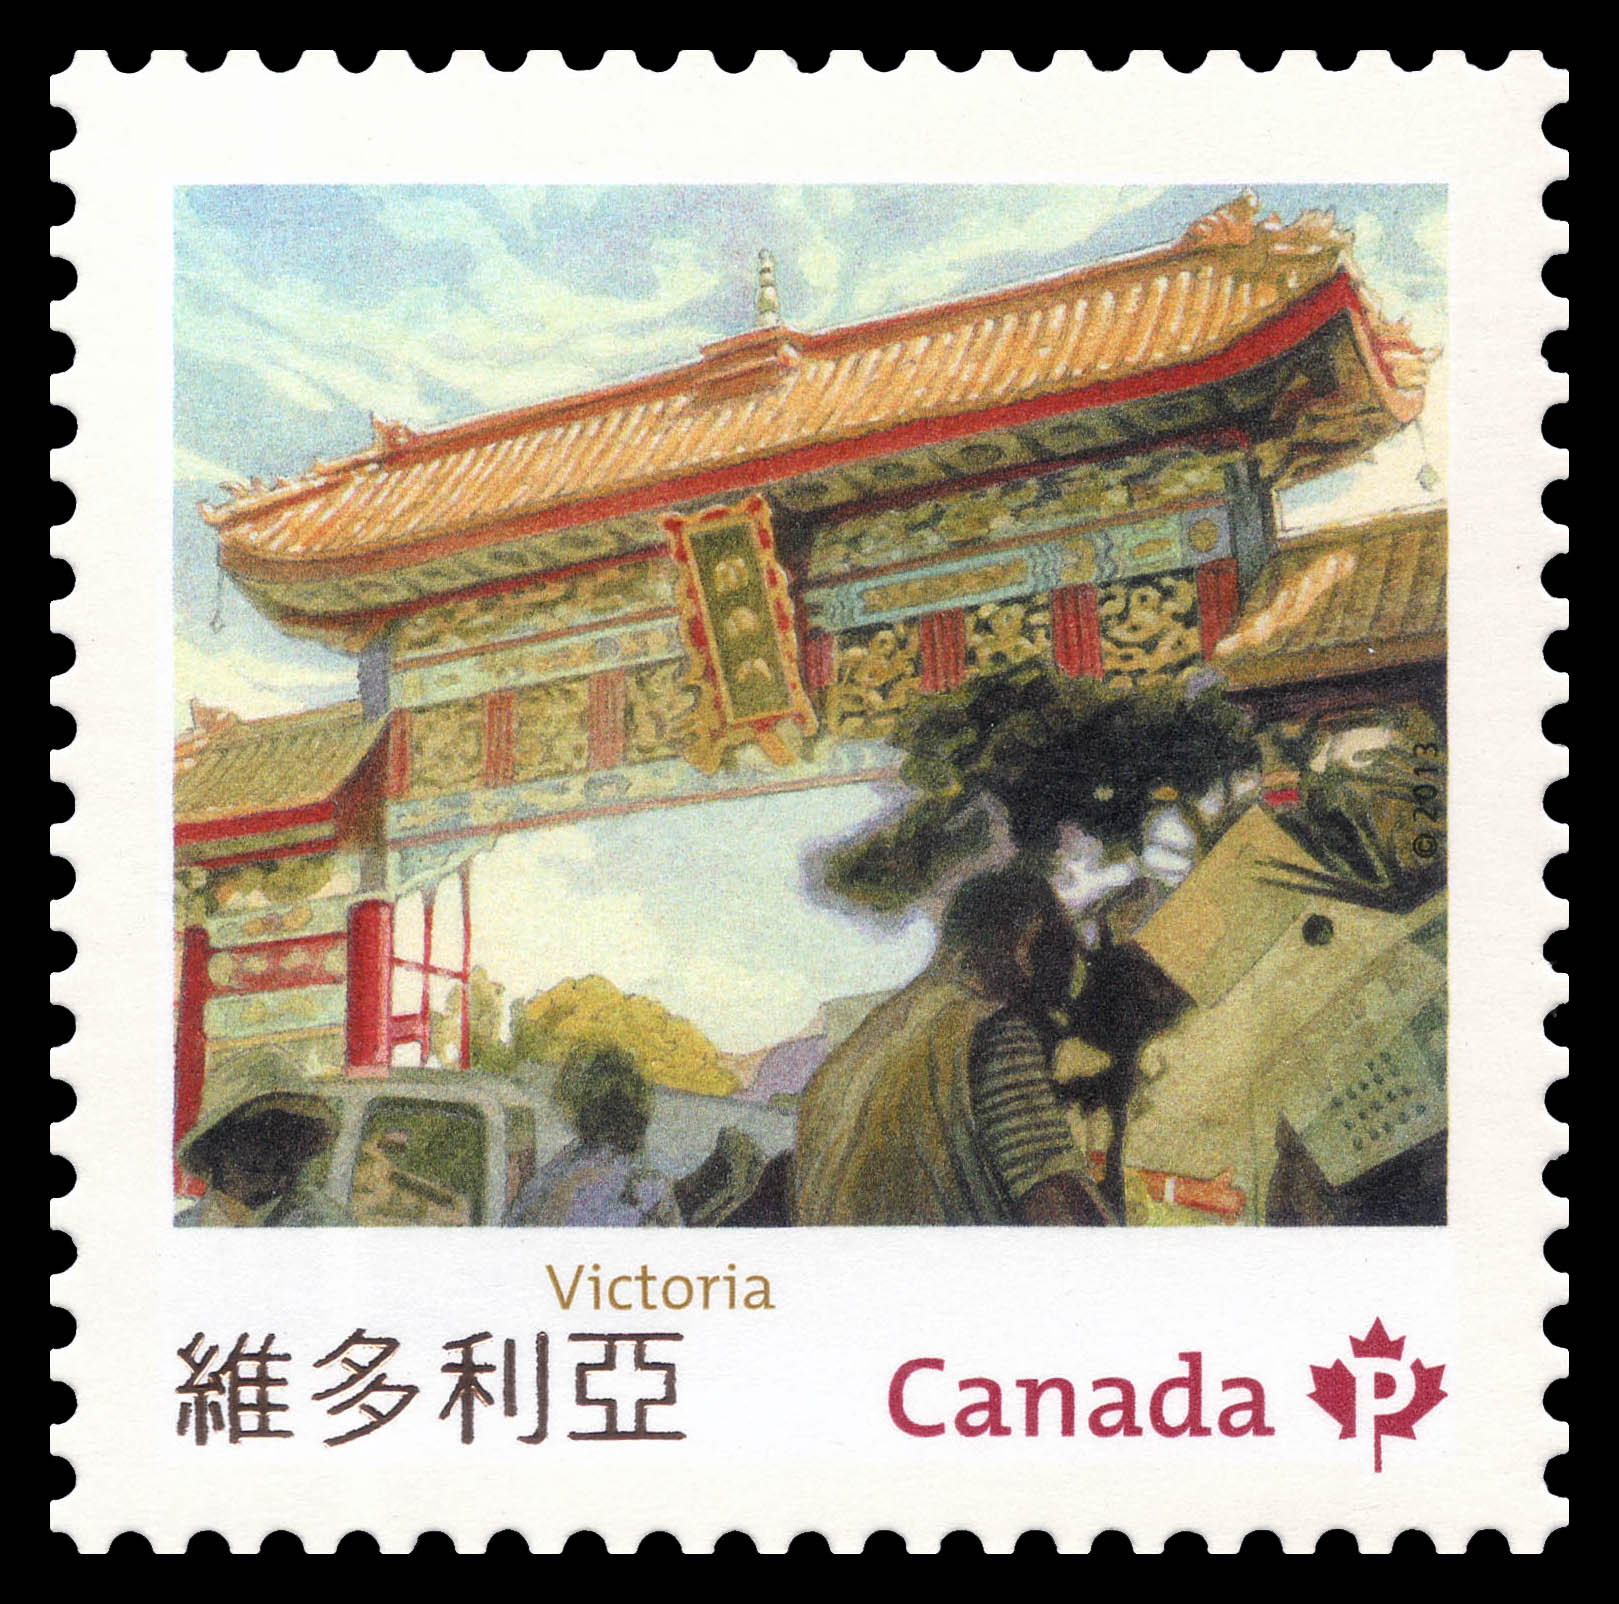 Victoria Chinatown Gate Canada Postage Stamp | Chinatown Gates